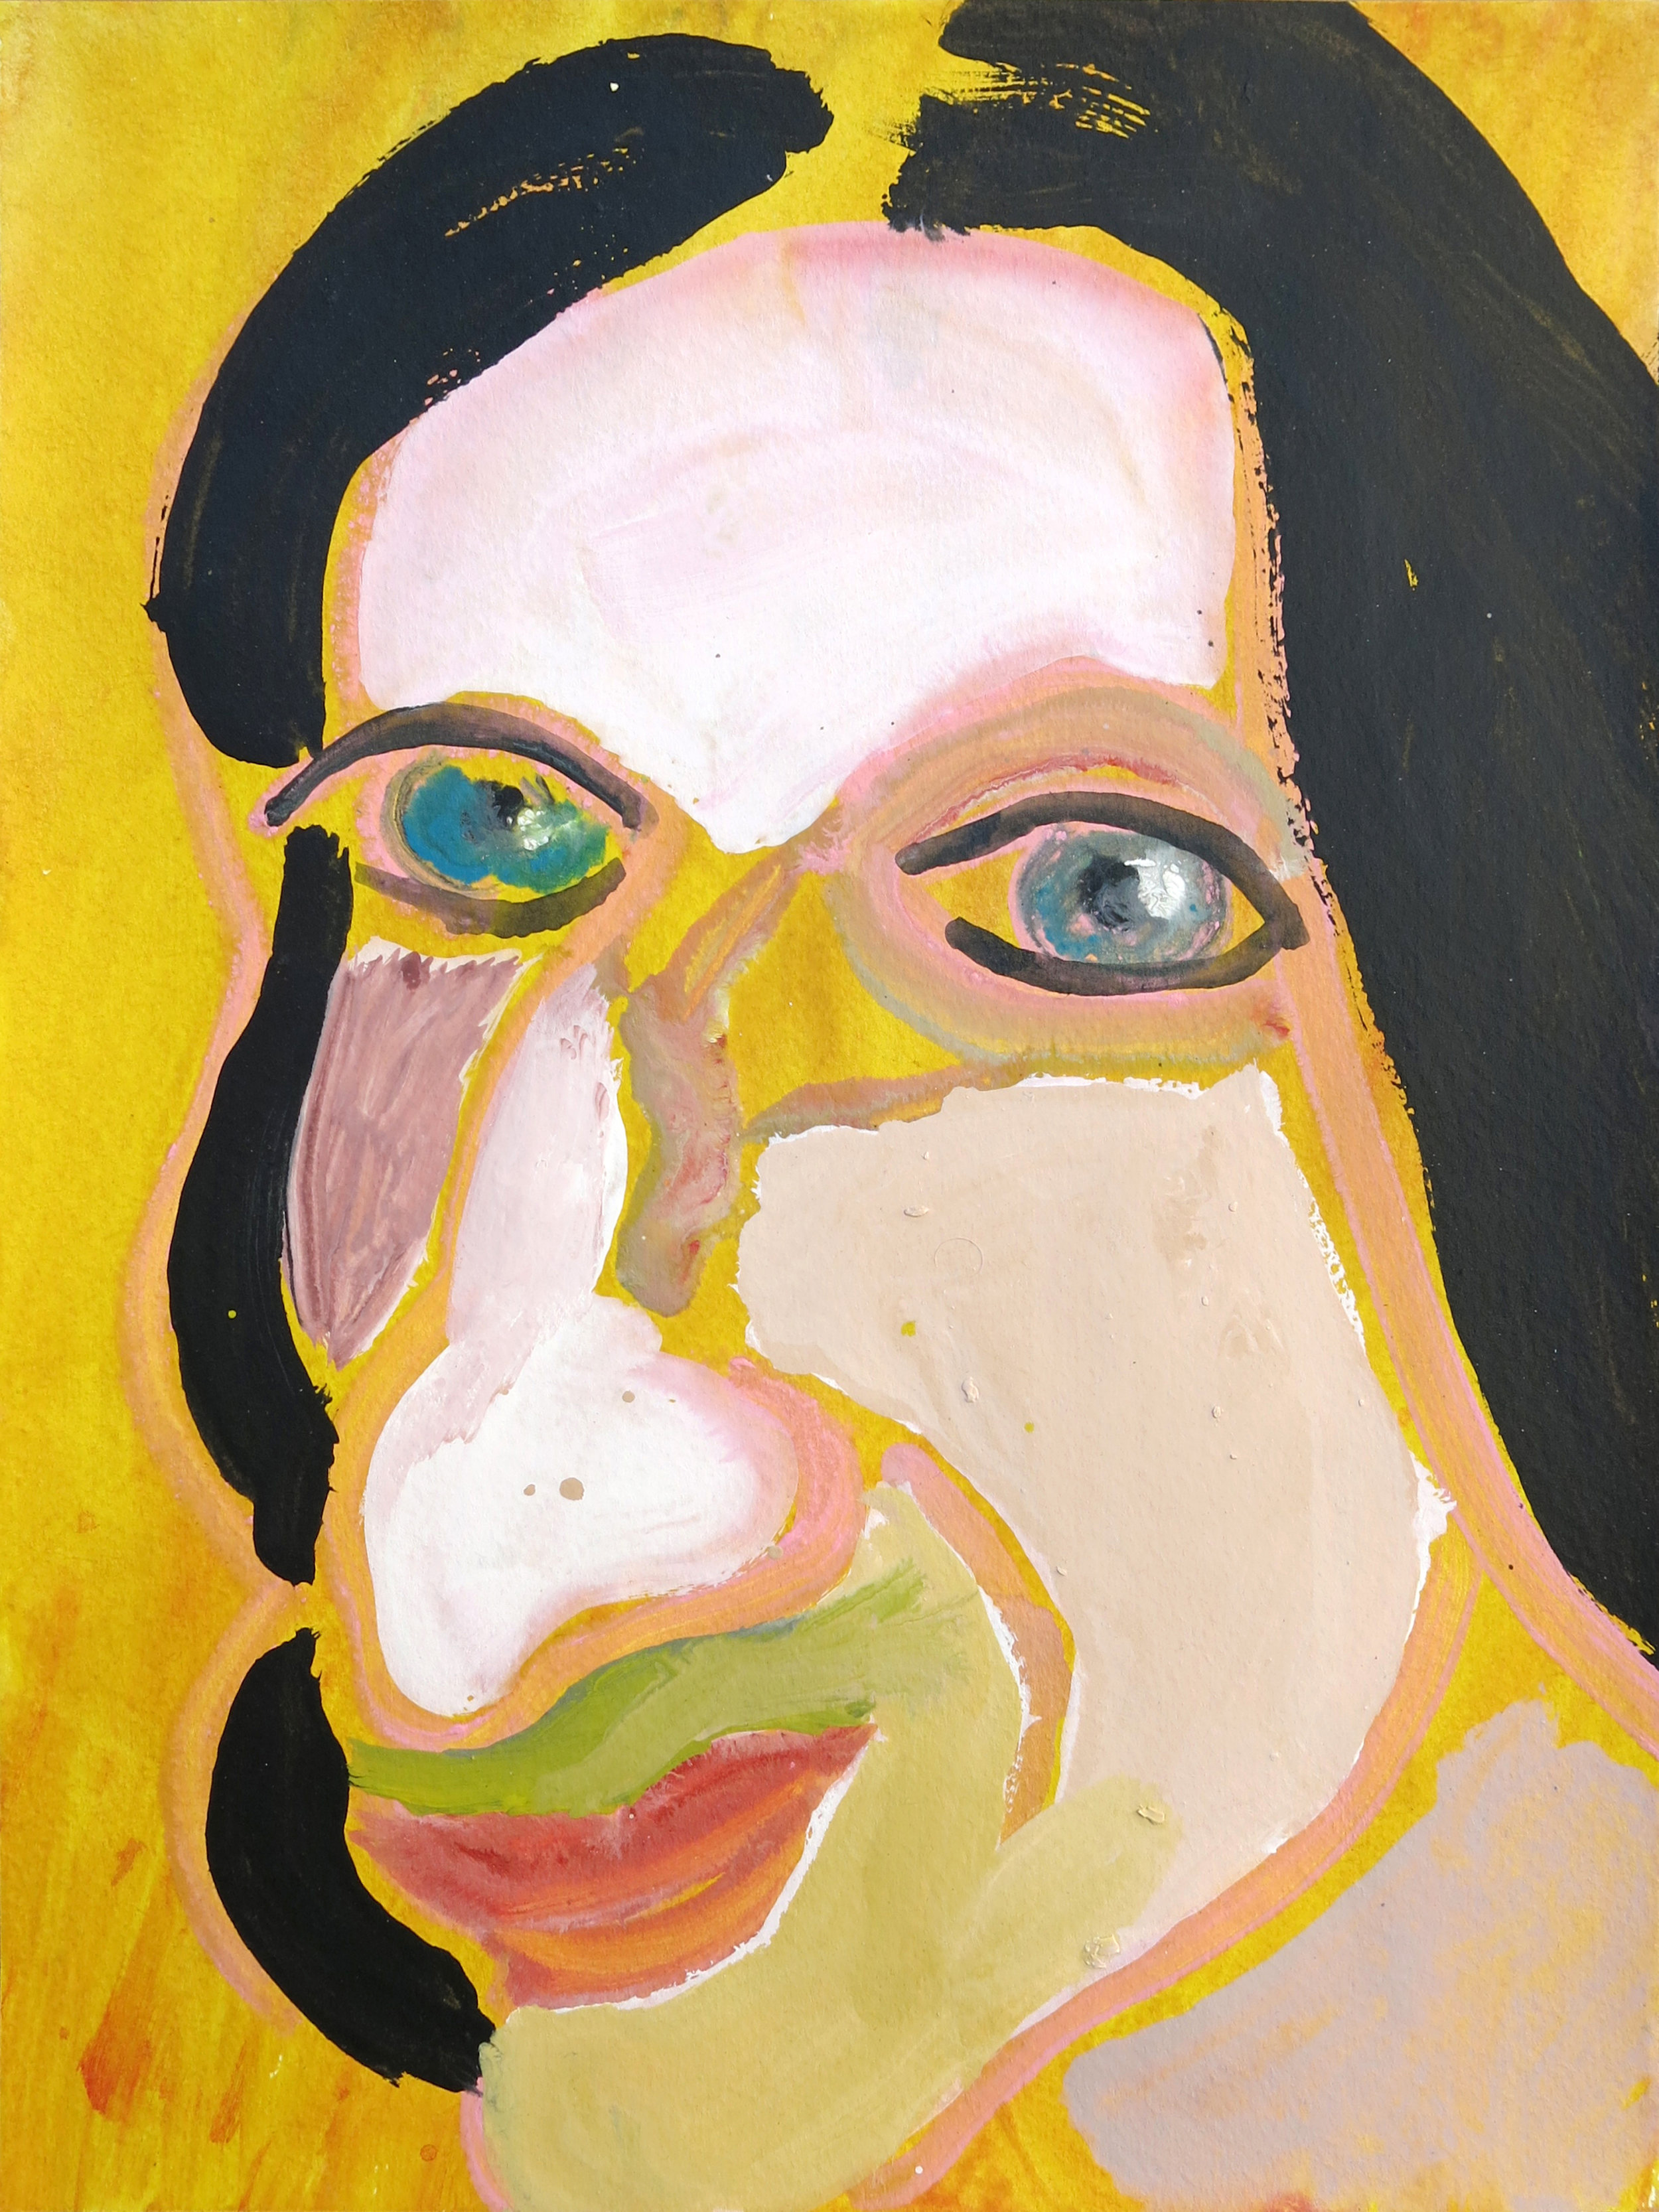 Barbra Streisand Portrait #174